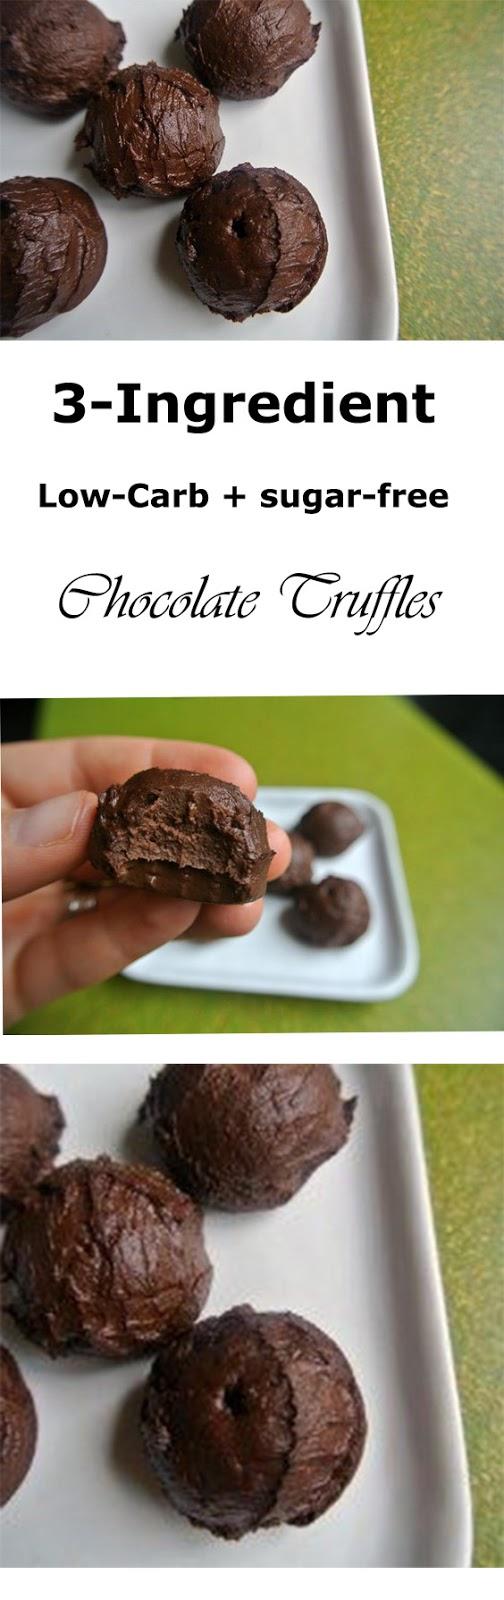 3-Ingredient Low-Carb Chocolate Truffles